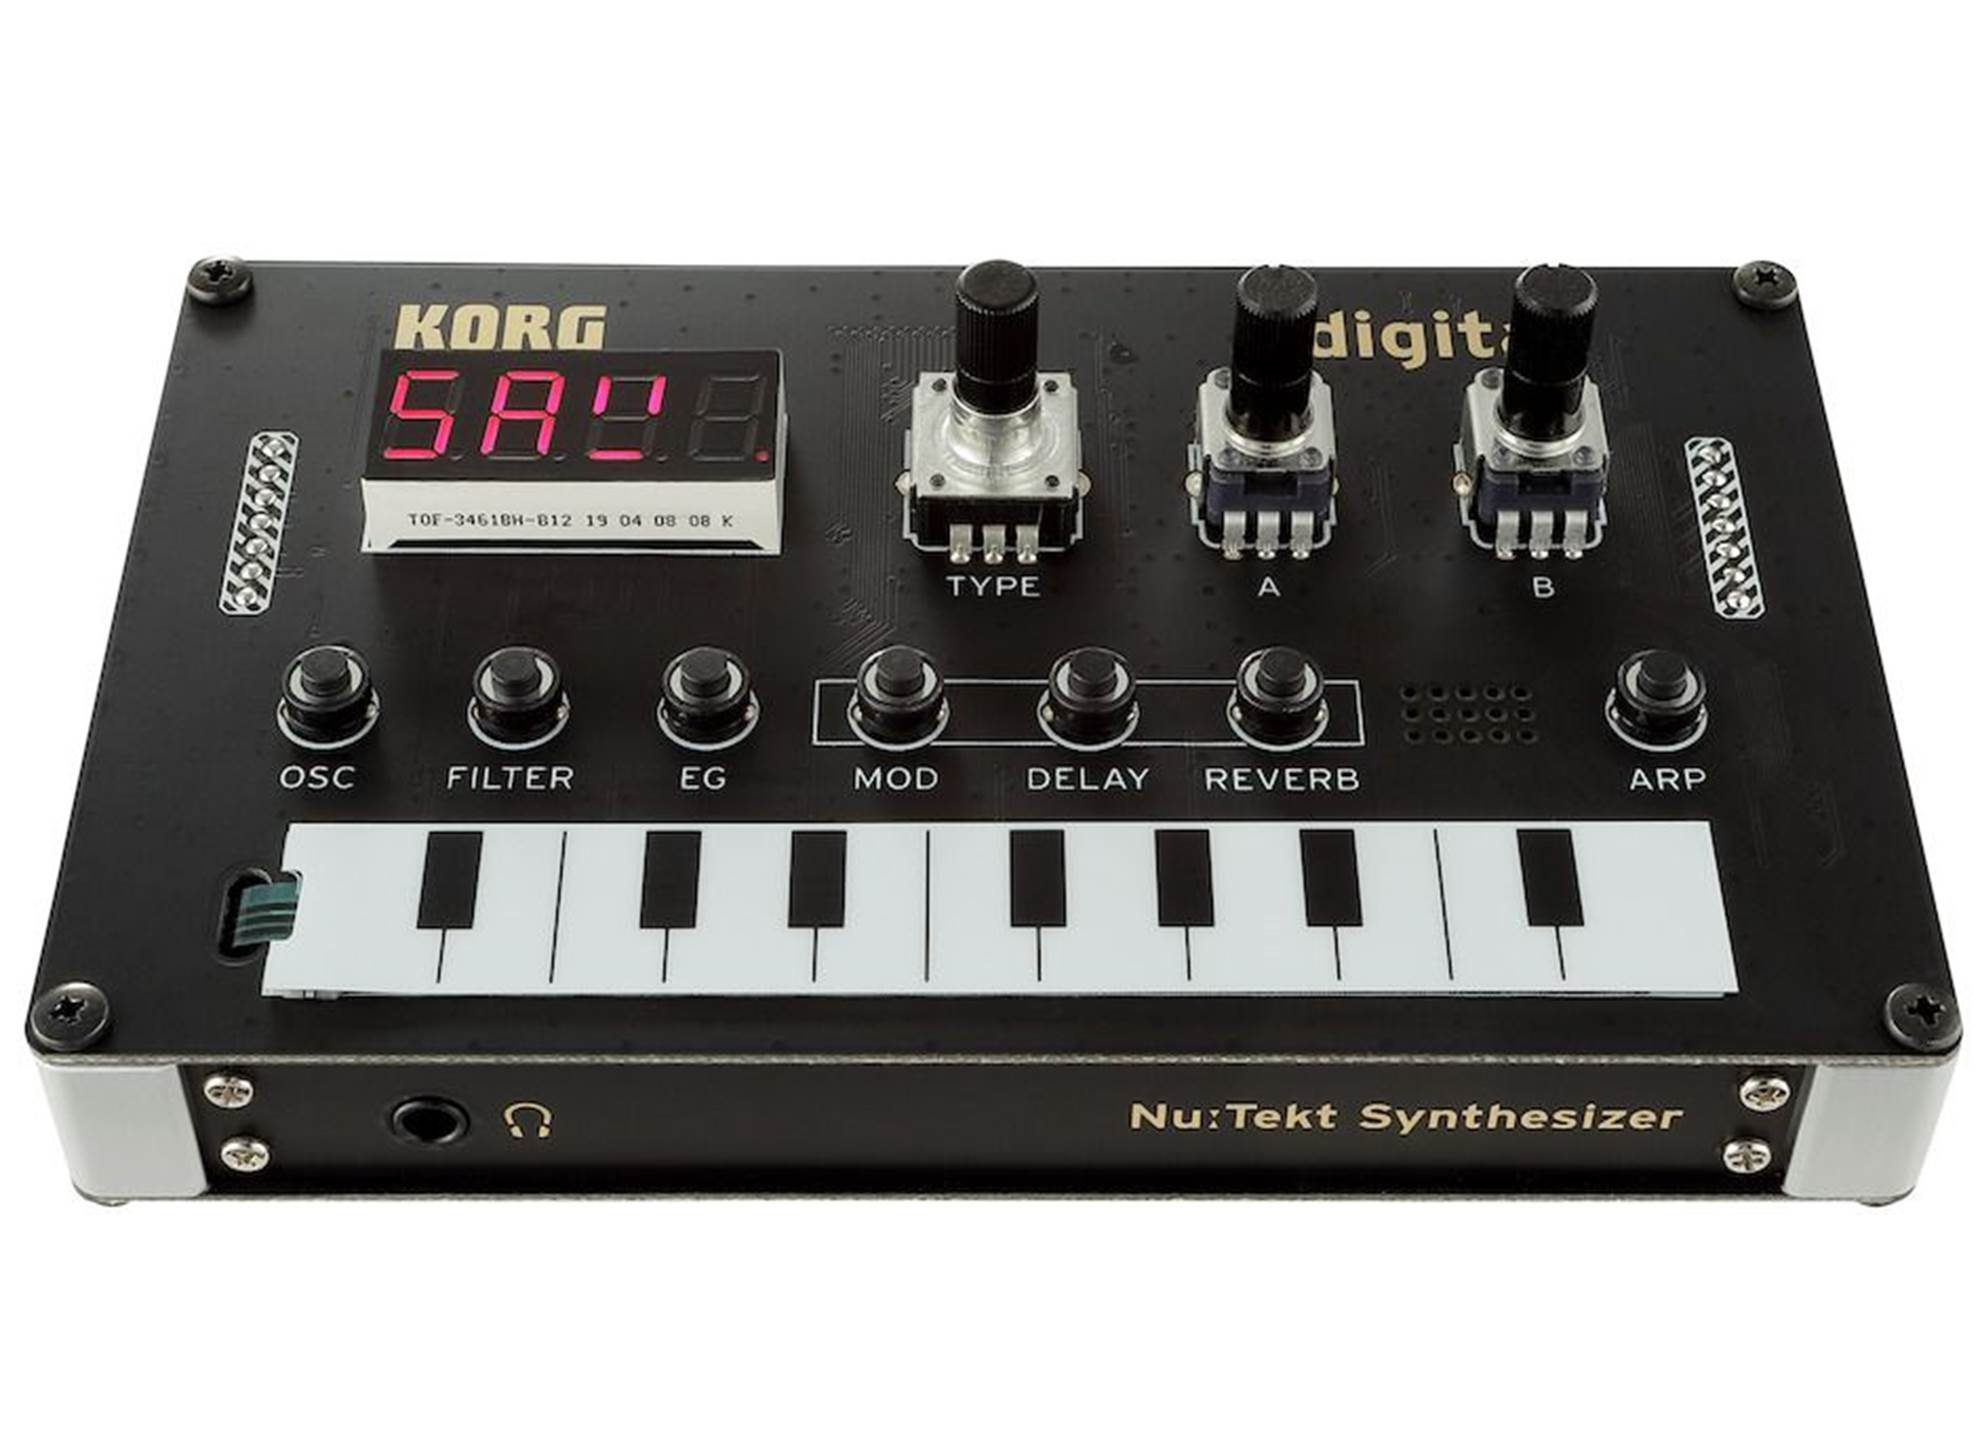 NTS-1 NuTekt Synth DIY kit